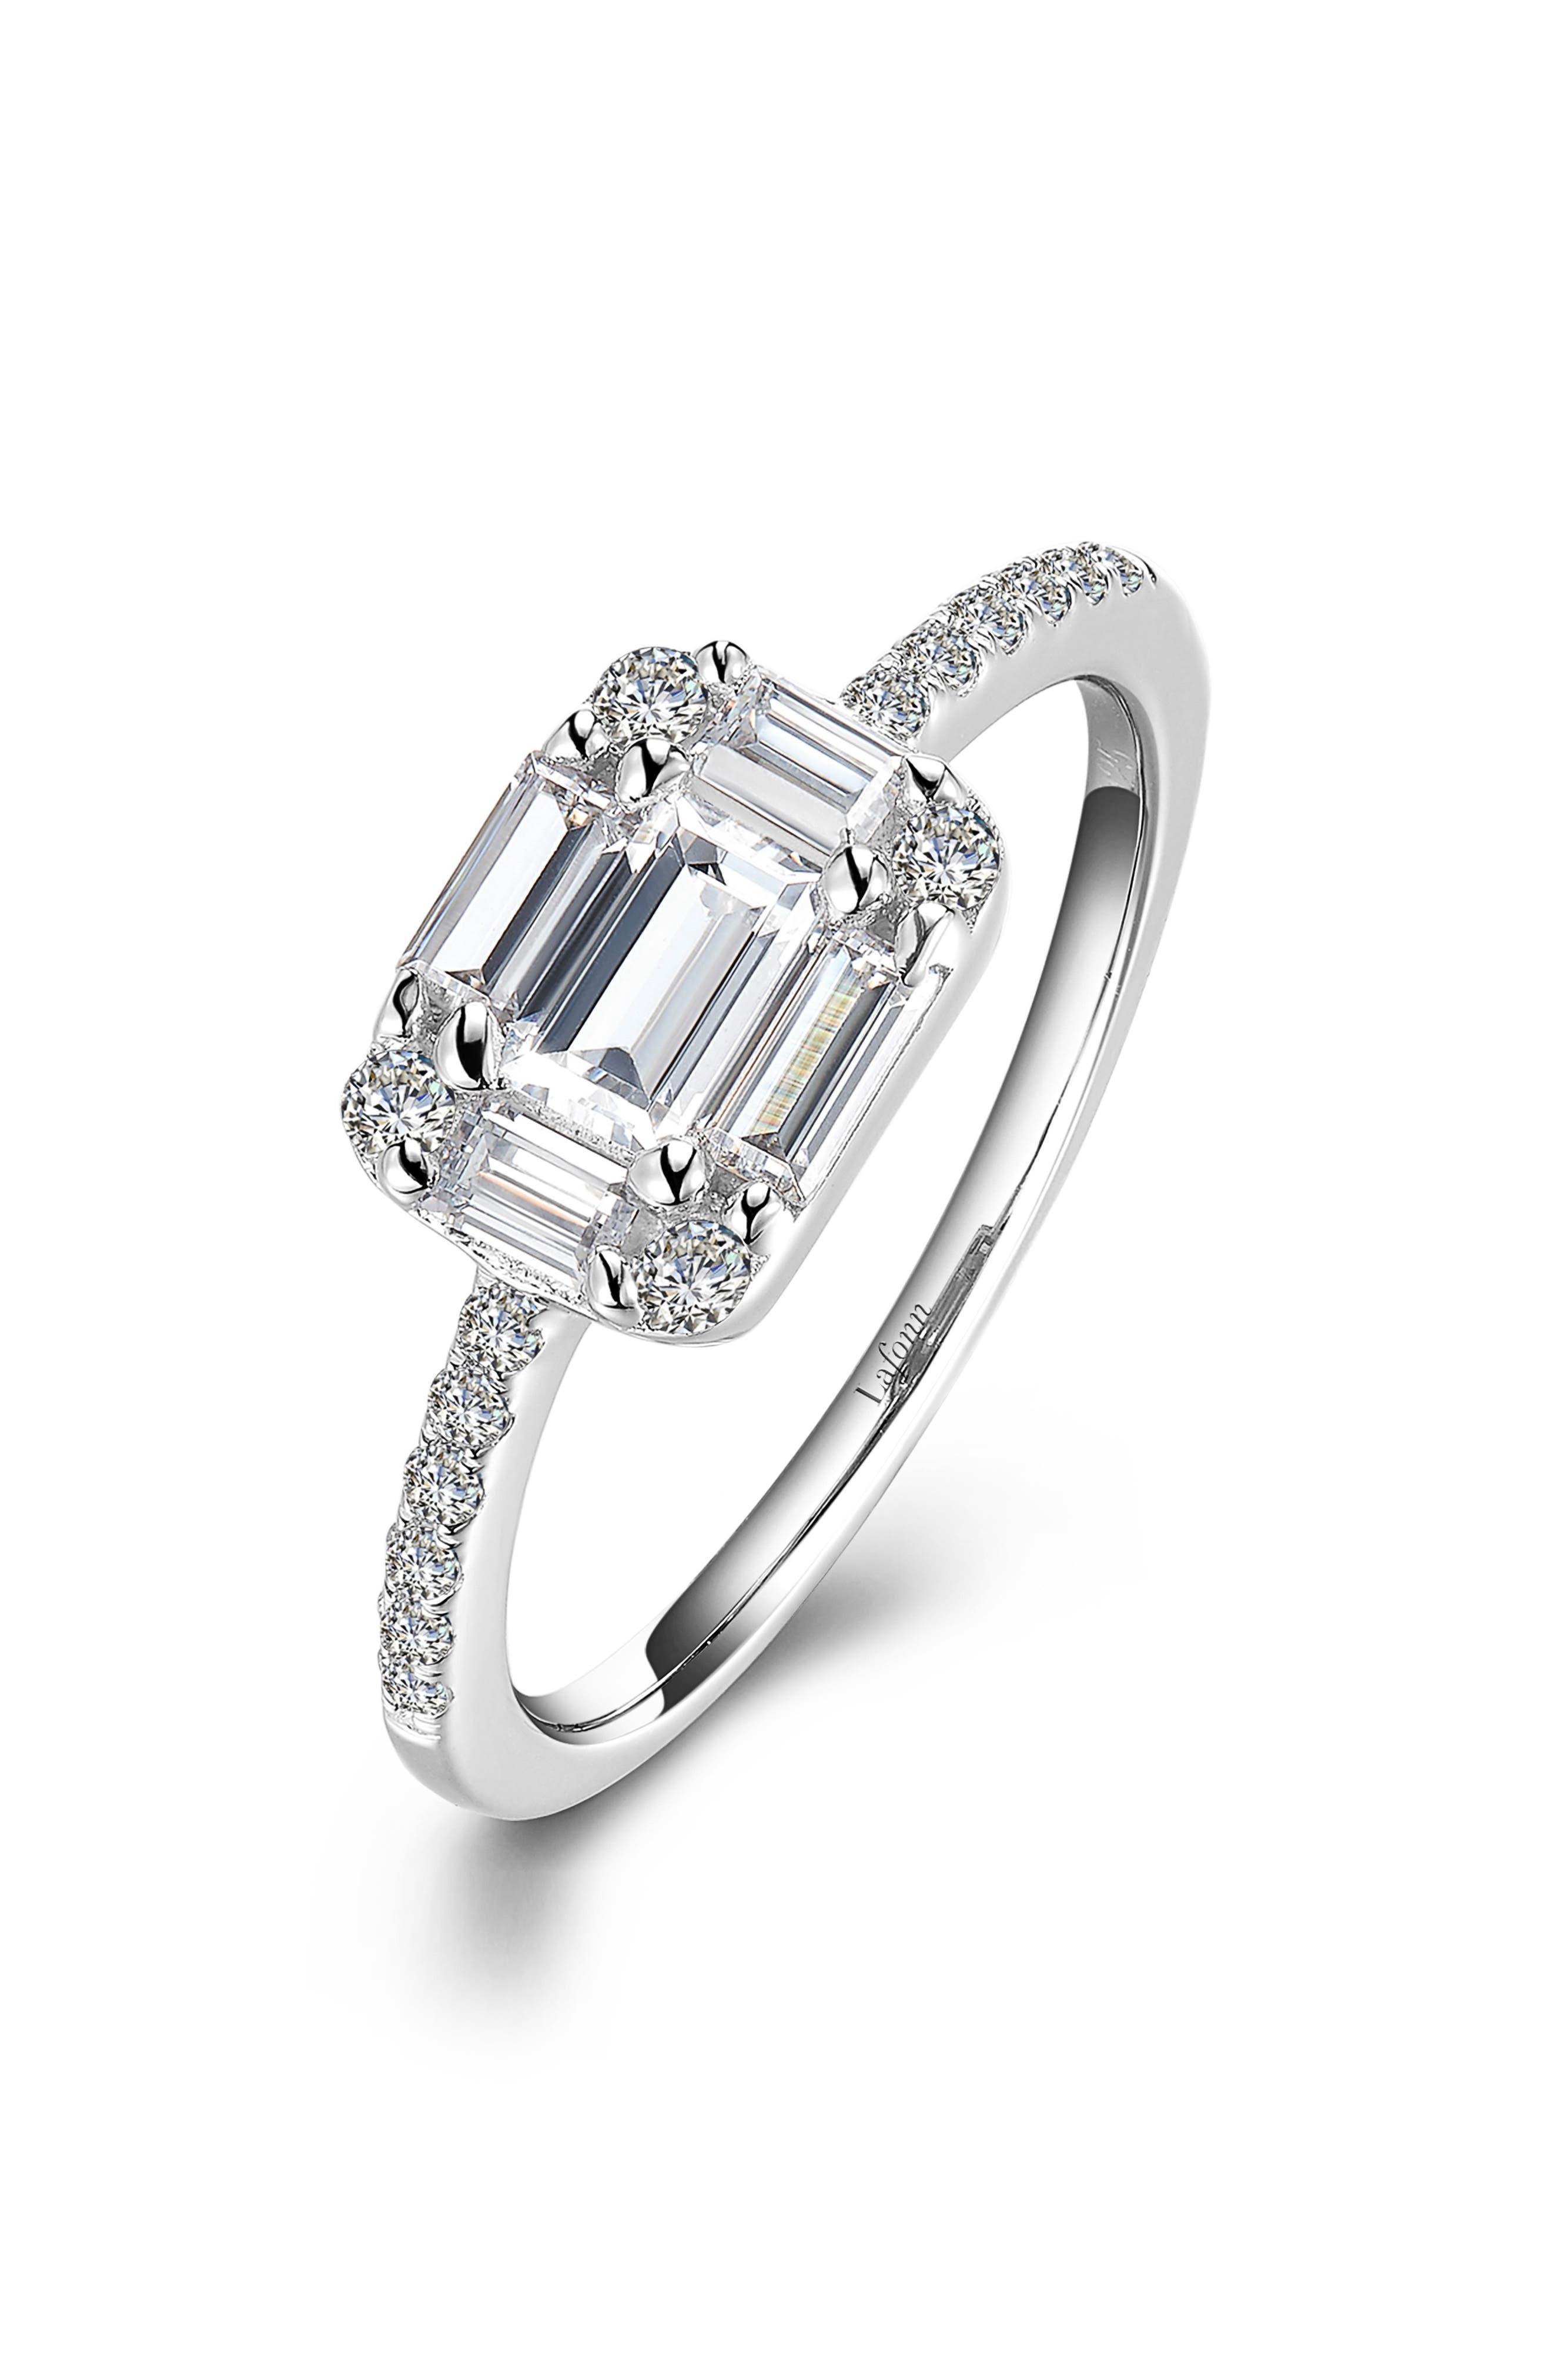 LAFONN, Emerald-Shaped Baguette Ring, Main thumbnail 1, color, SILVER/ CLEAR